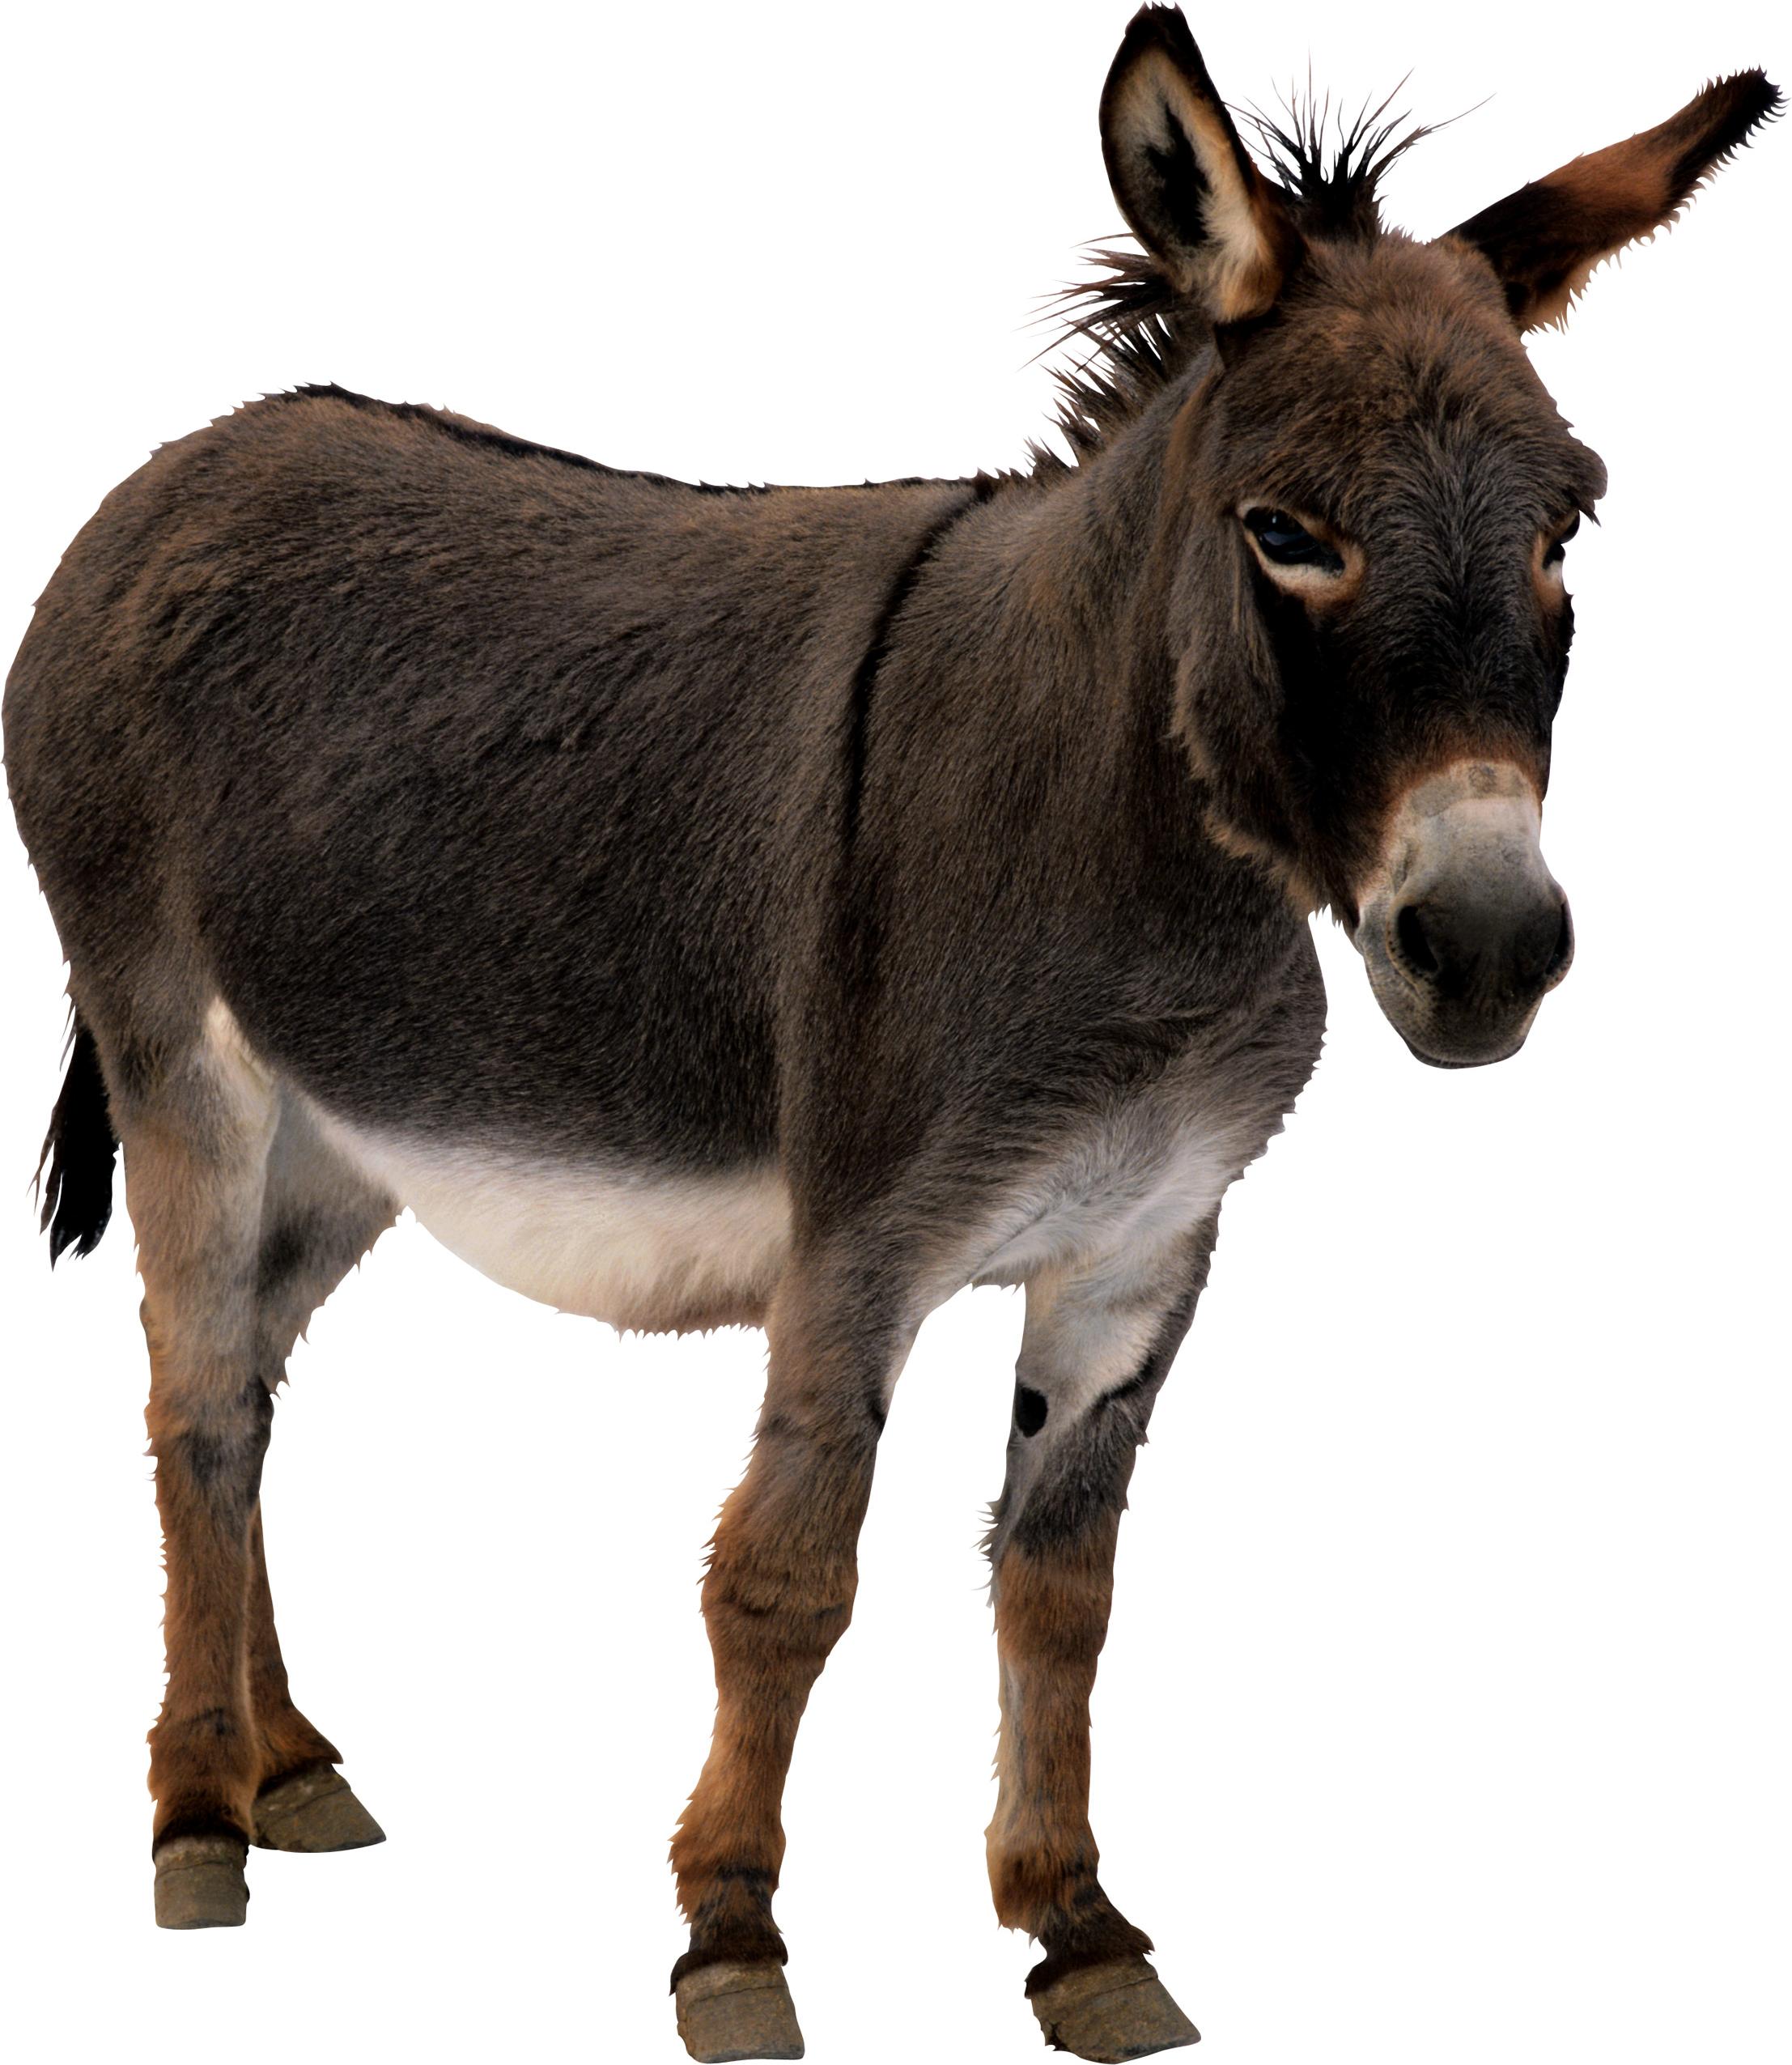 Donkey HD PNG